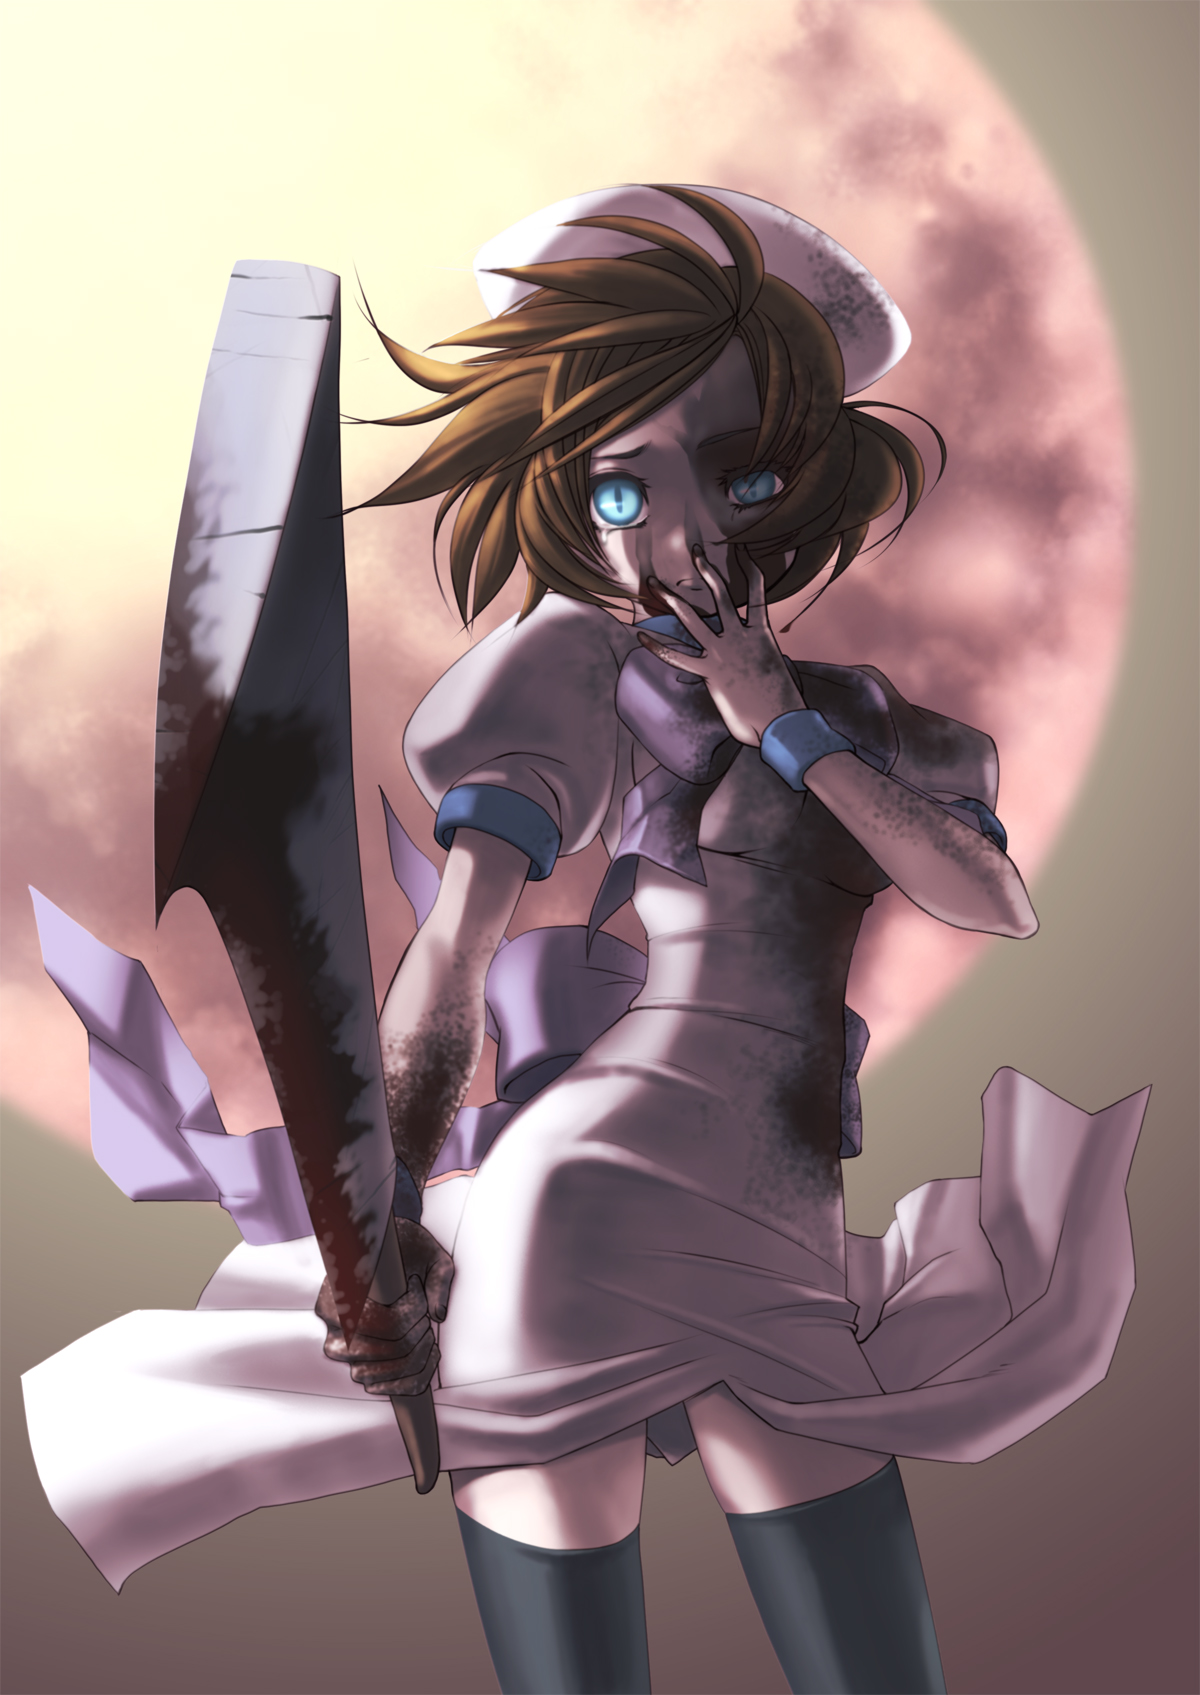 Image Result For Crazy Anime Girl Wallpaper